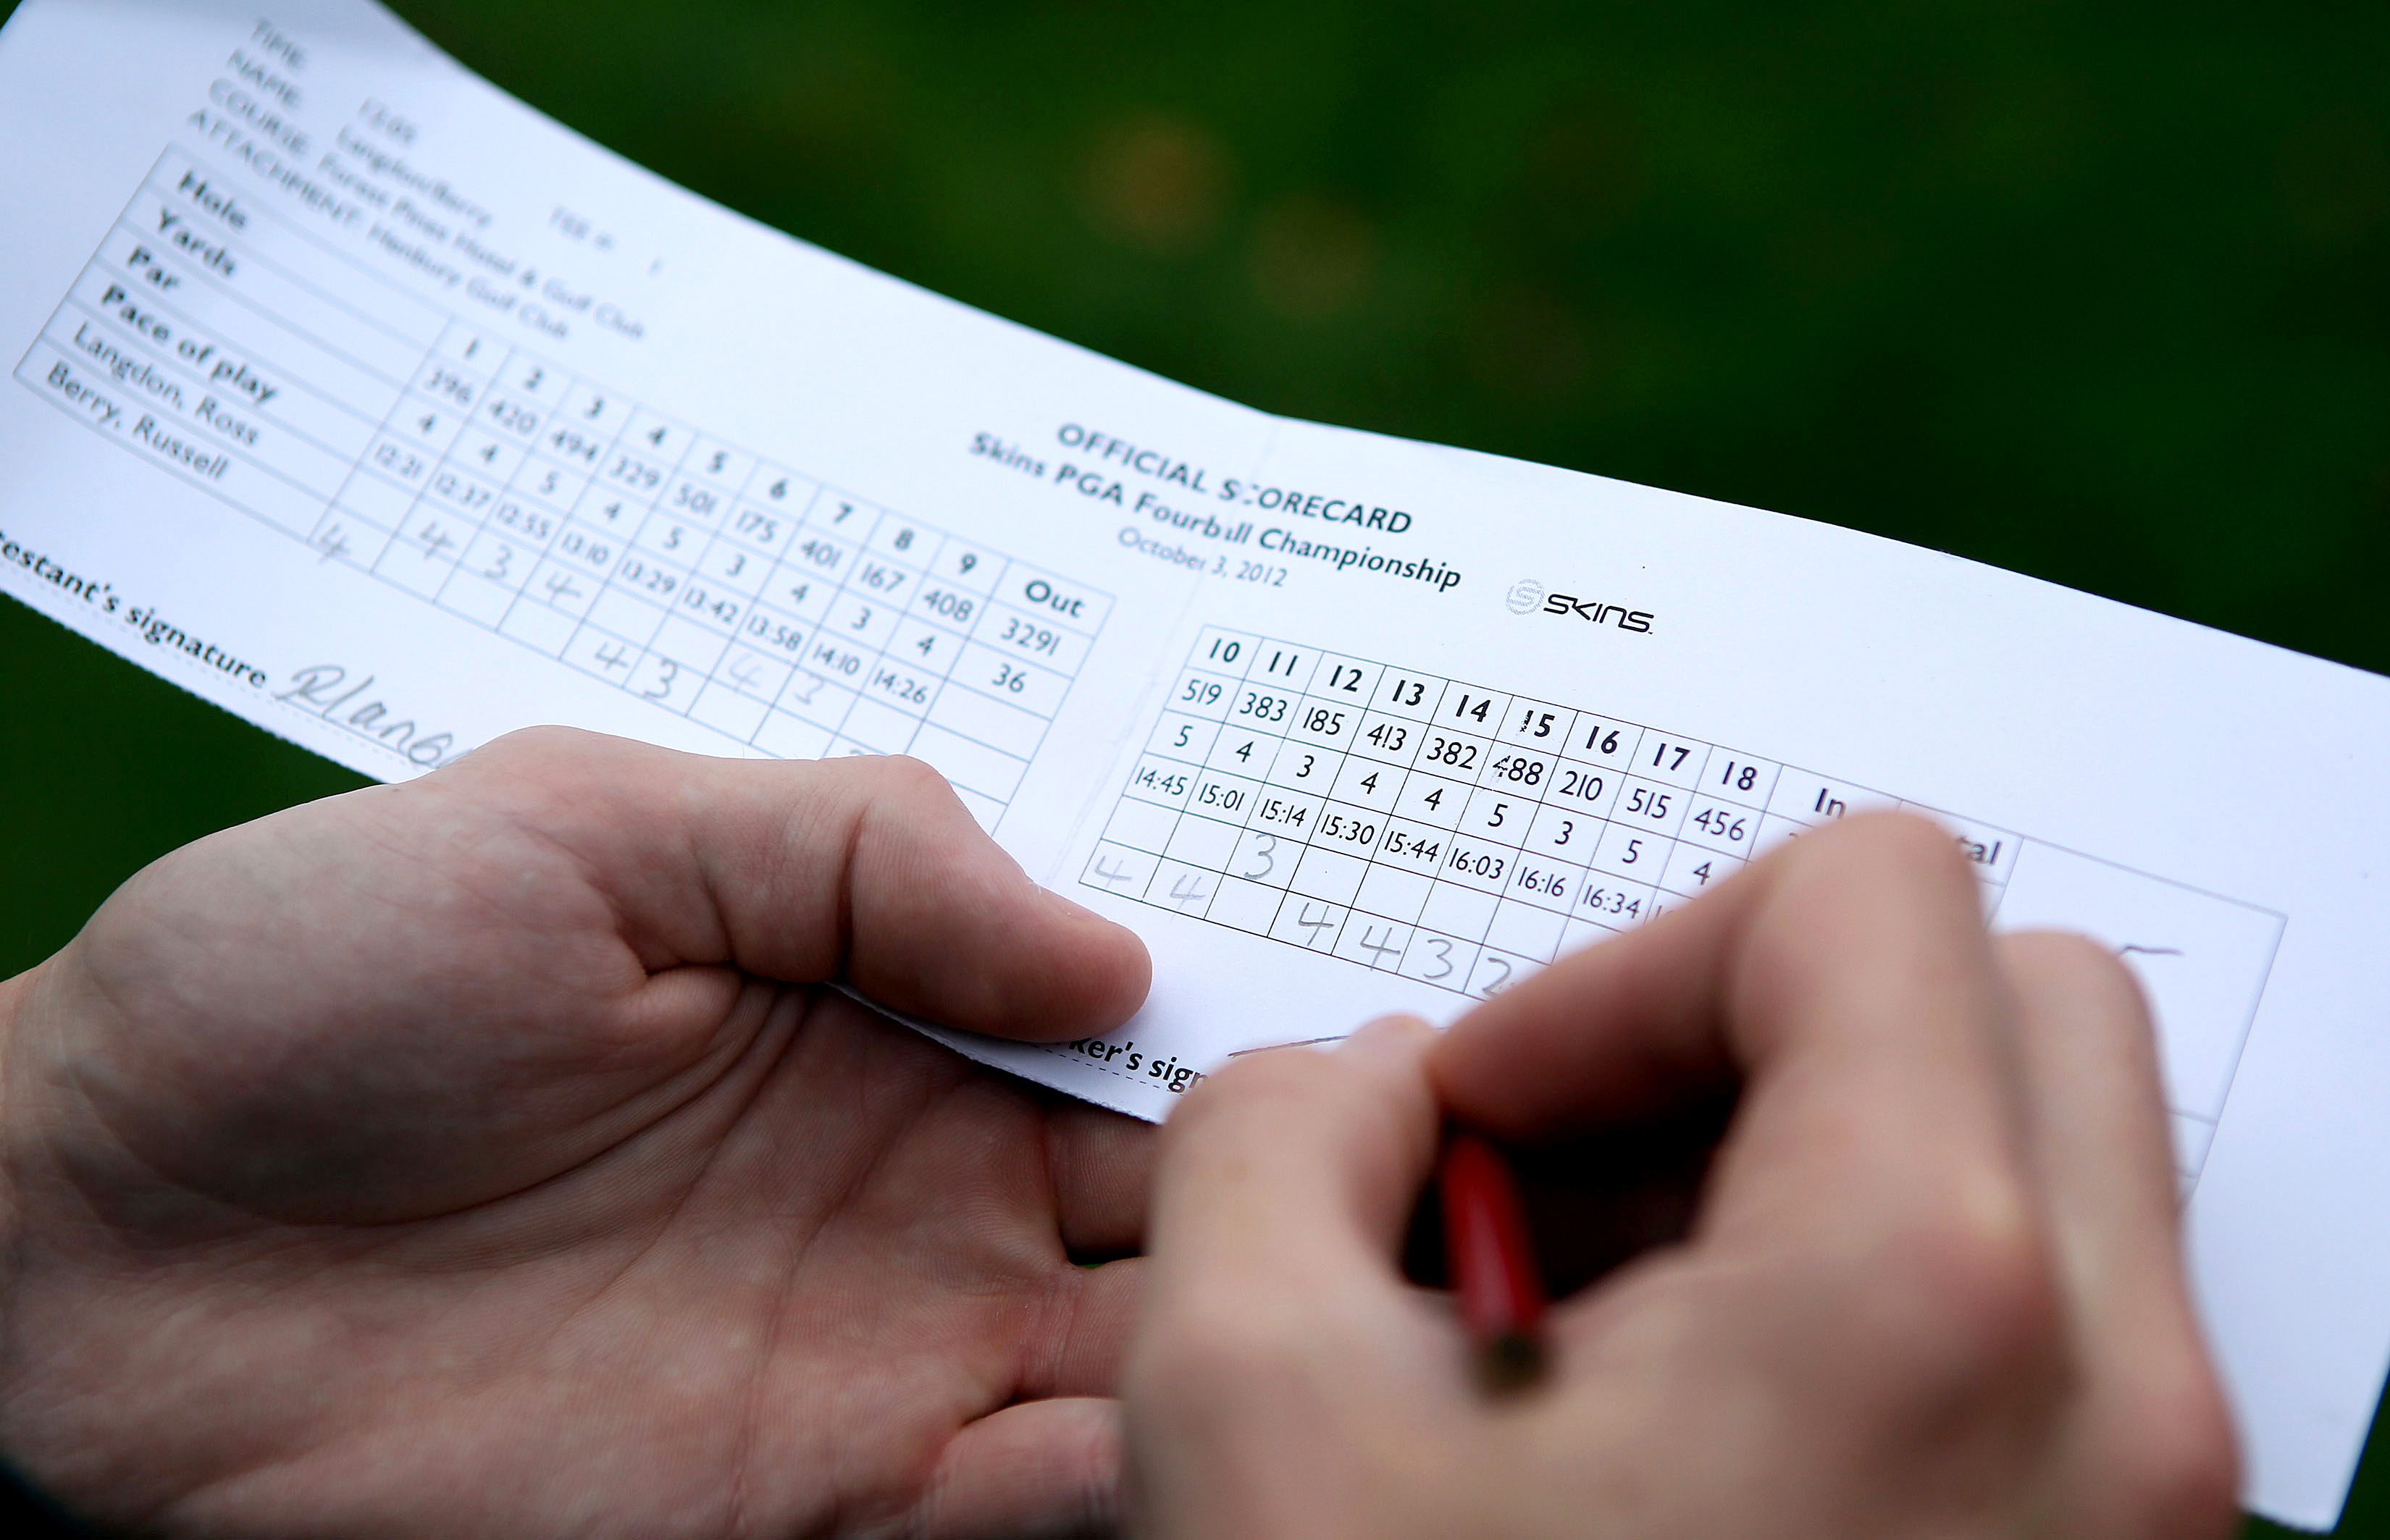 Stableford Golf Scoring Spreadsheet Regarding Golf Scorecard Rules  Simple But Important  Golf Monthly